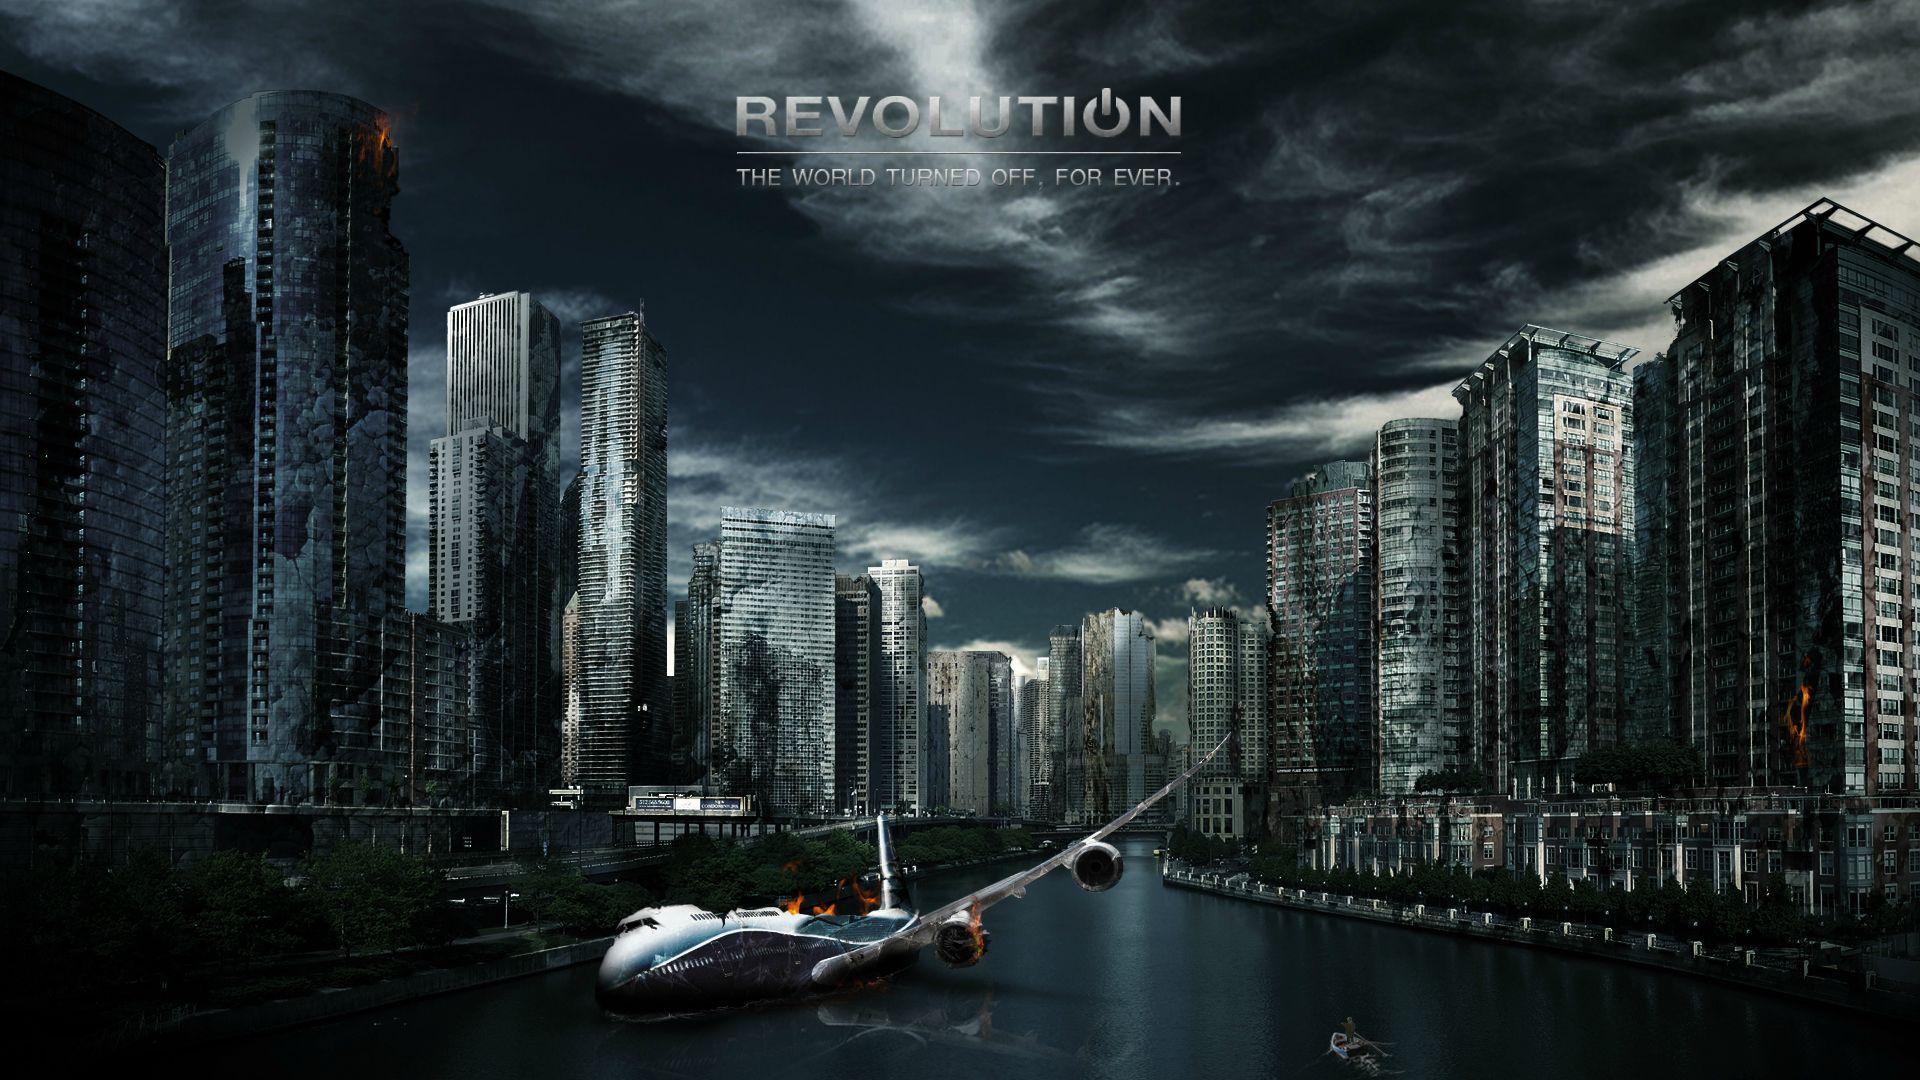 Revolution (2012) 灭世 Revolution-revolution-2012-tv-series-32462317-1920-1080